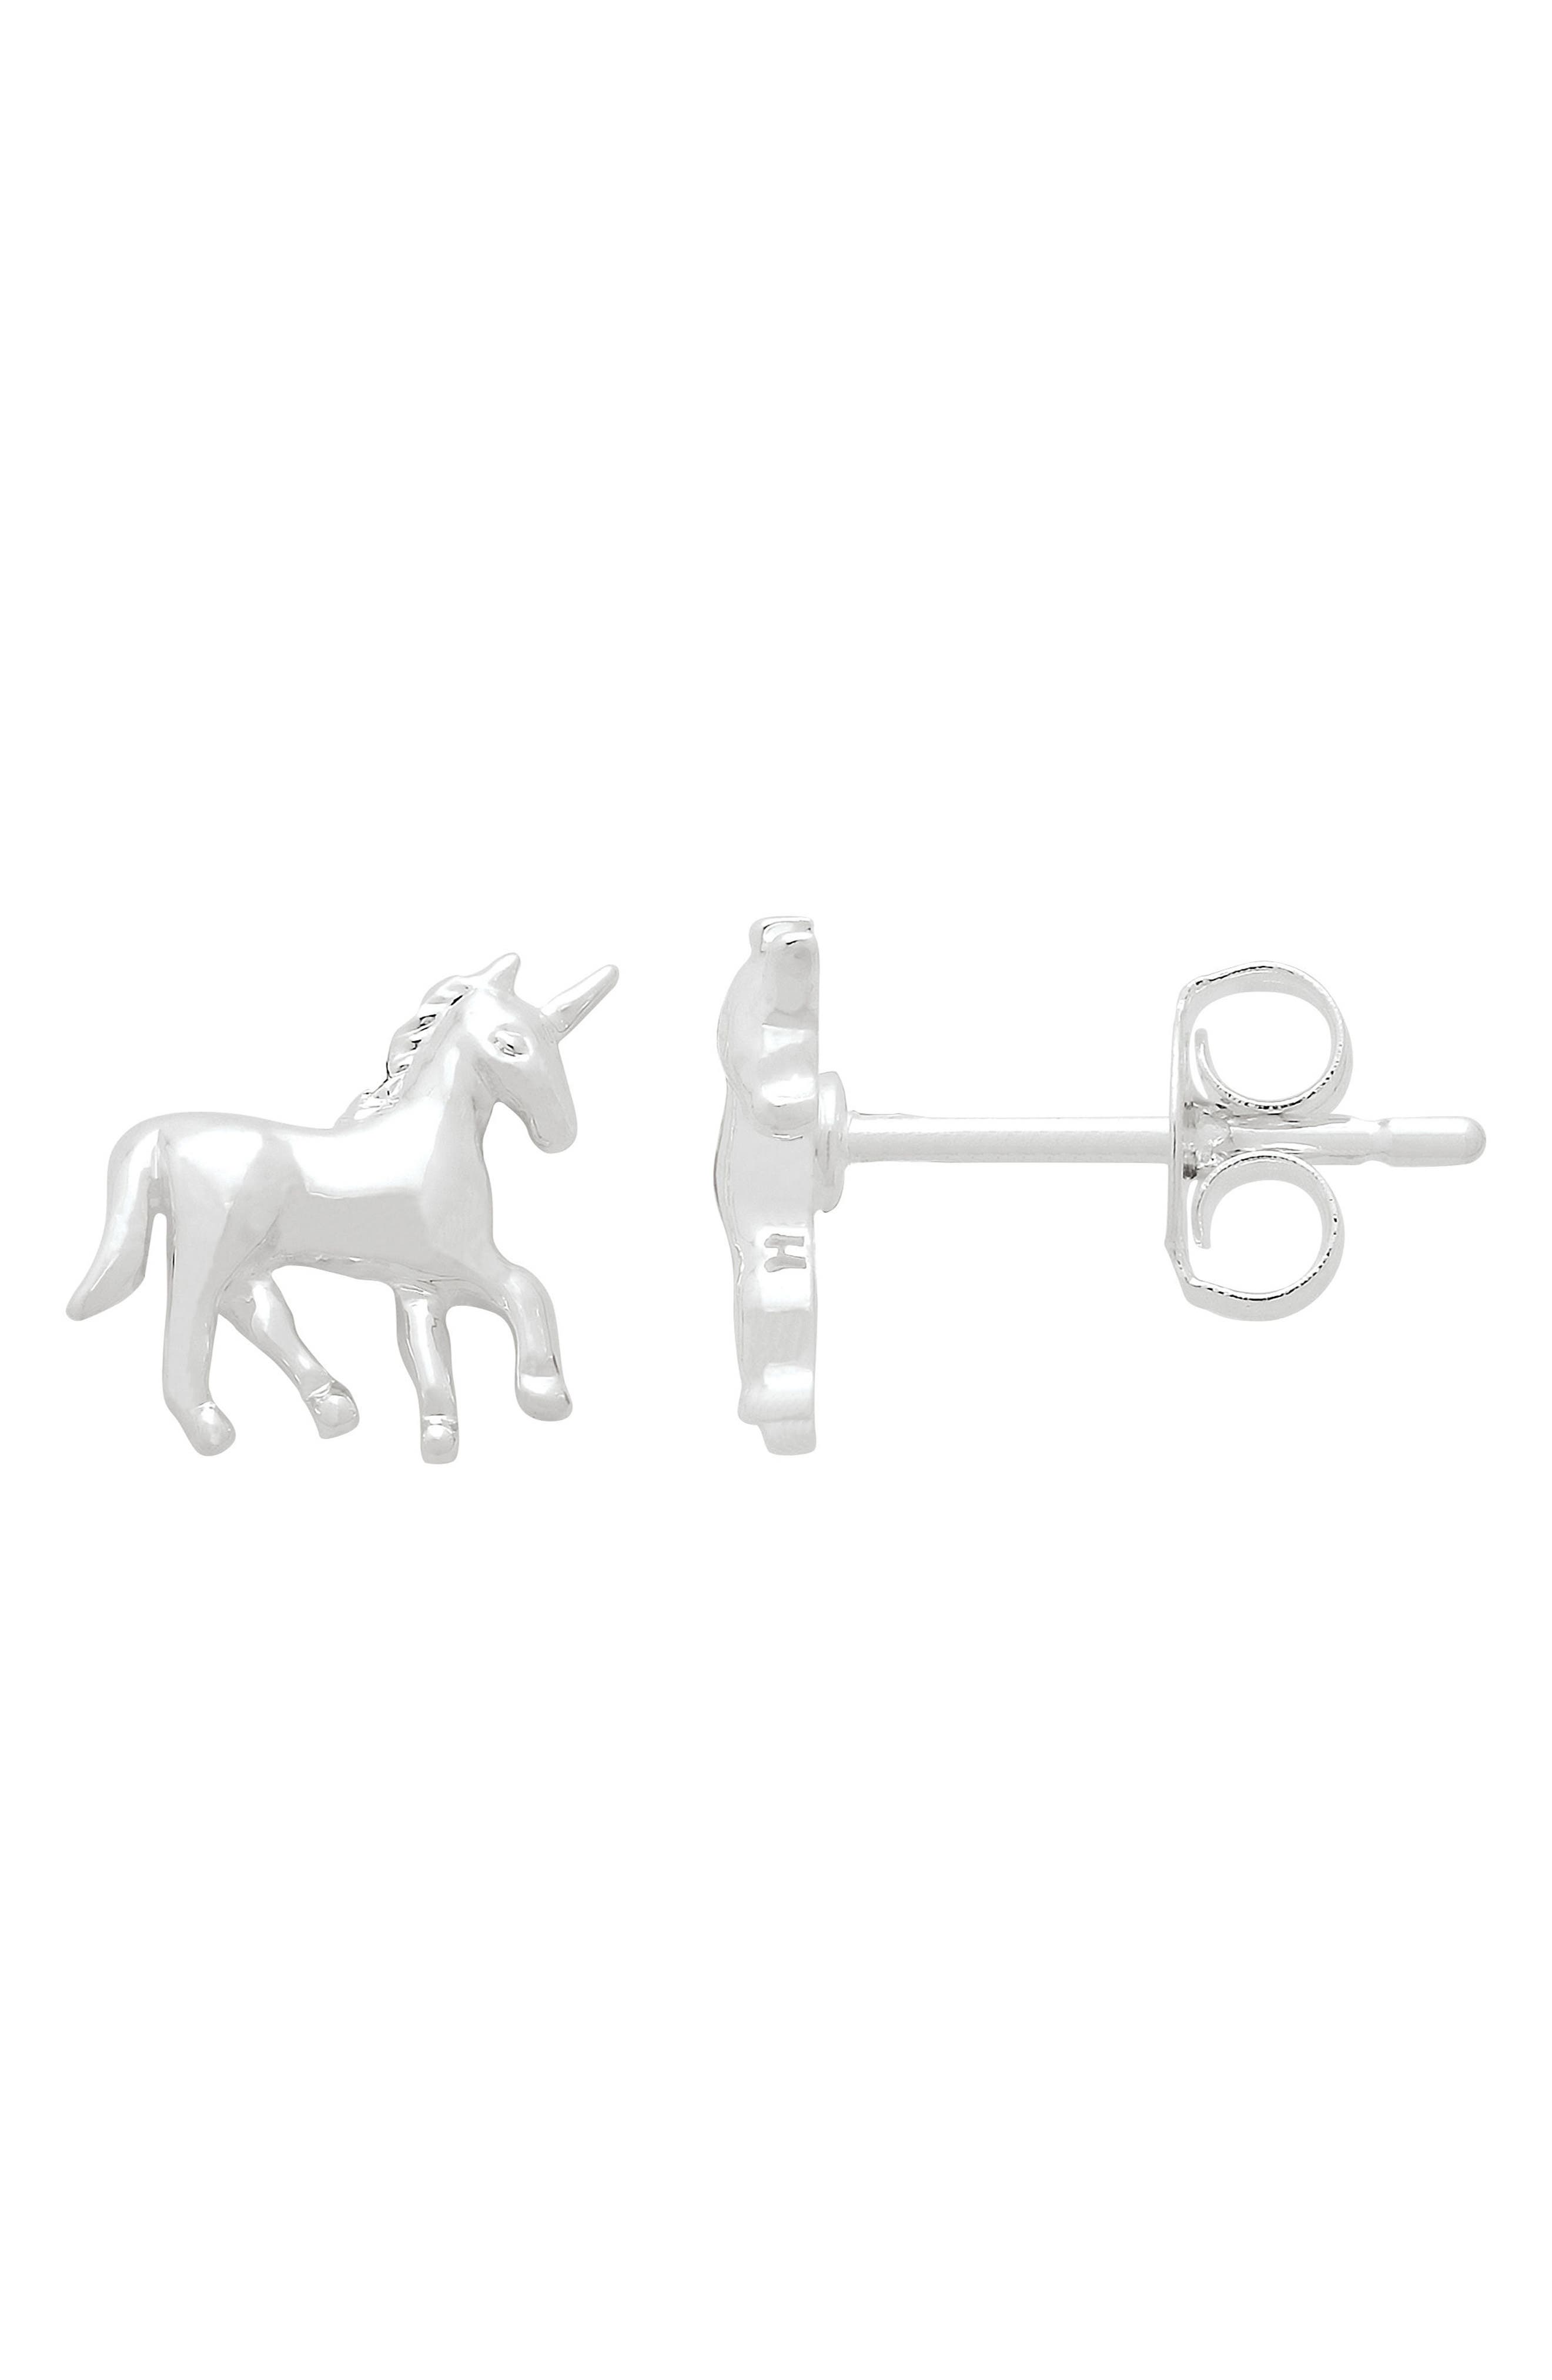 Unicorn Stud Earrings,                         Main,                         color, 040